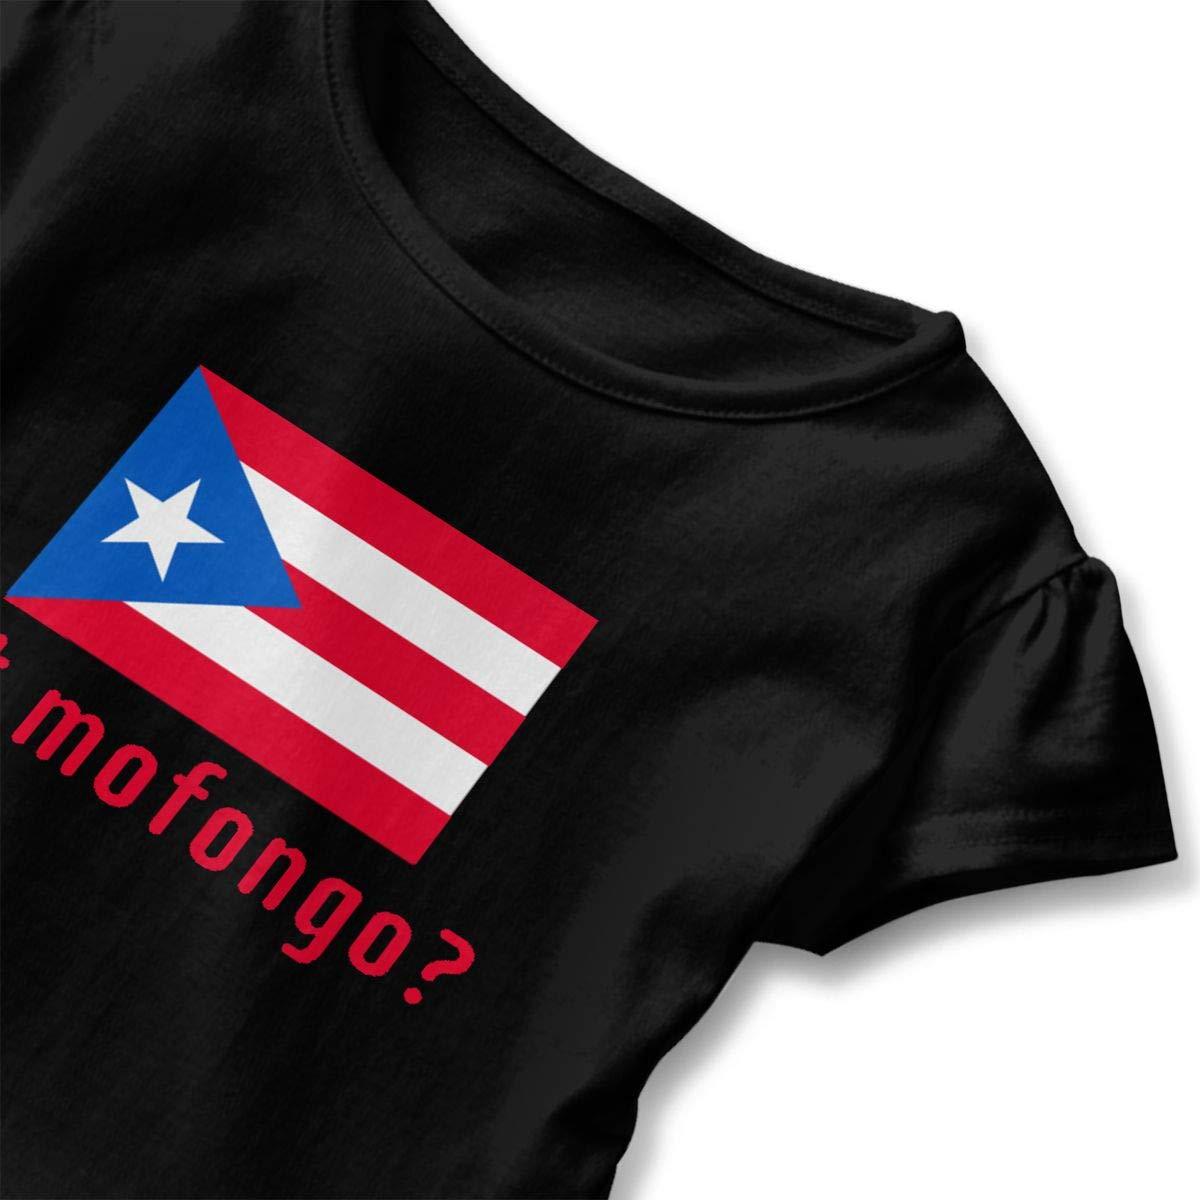 JVNSS Got Mofongo Puerto Rican Flag T-Shirt Baby Girl Flounced T Shirts Fashion Outfits for 2-6T Kids Girls